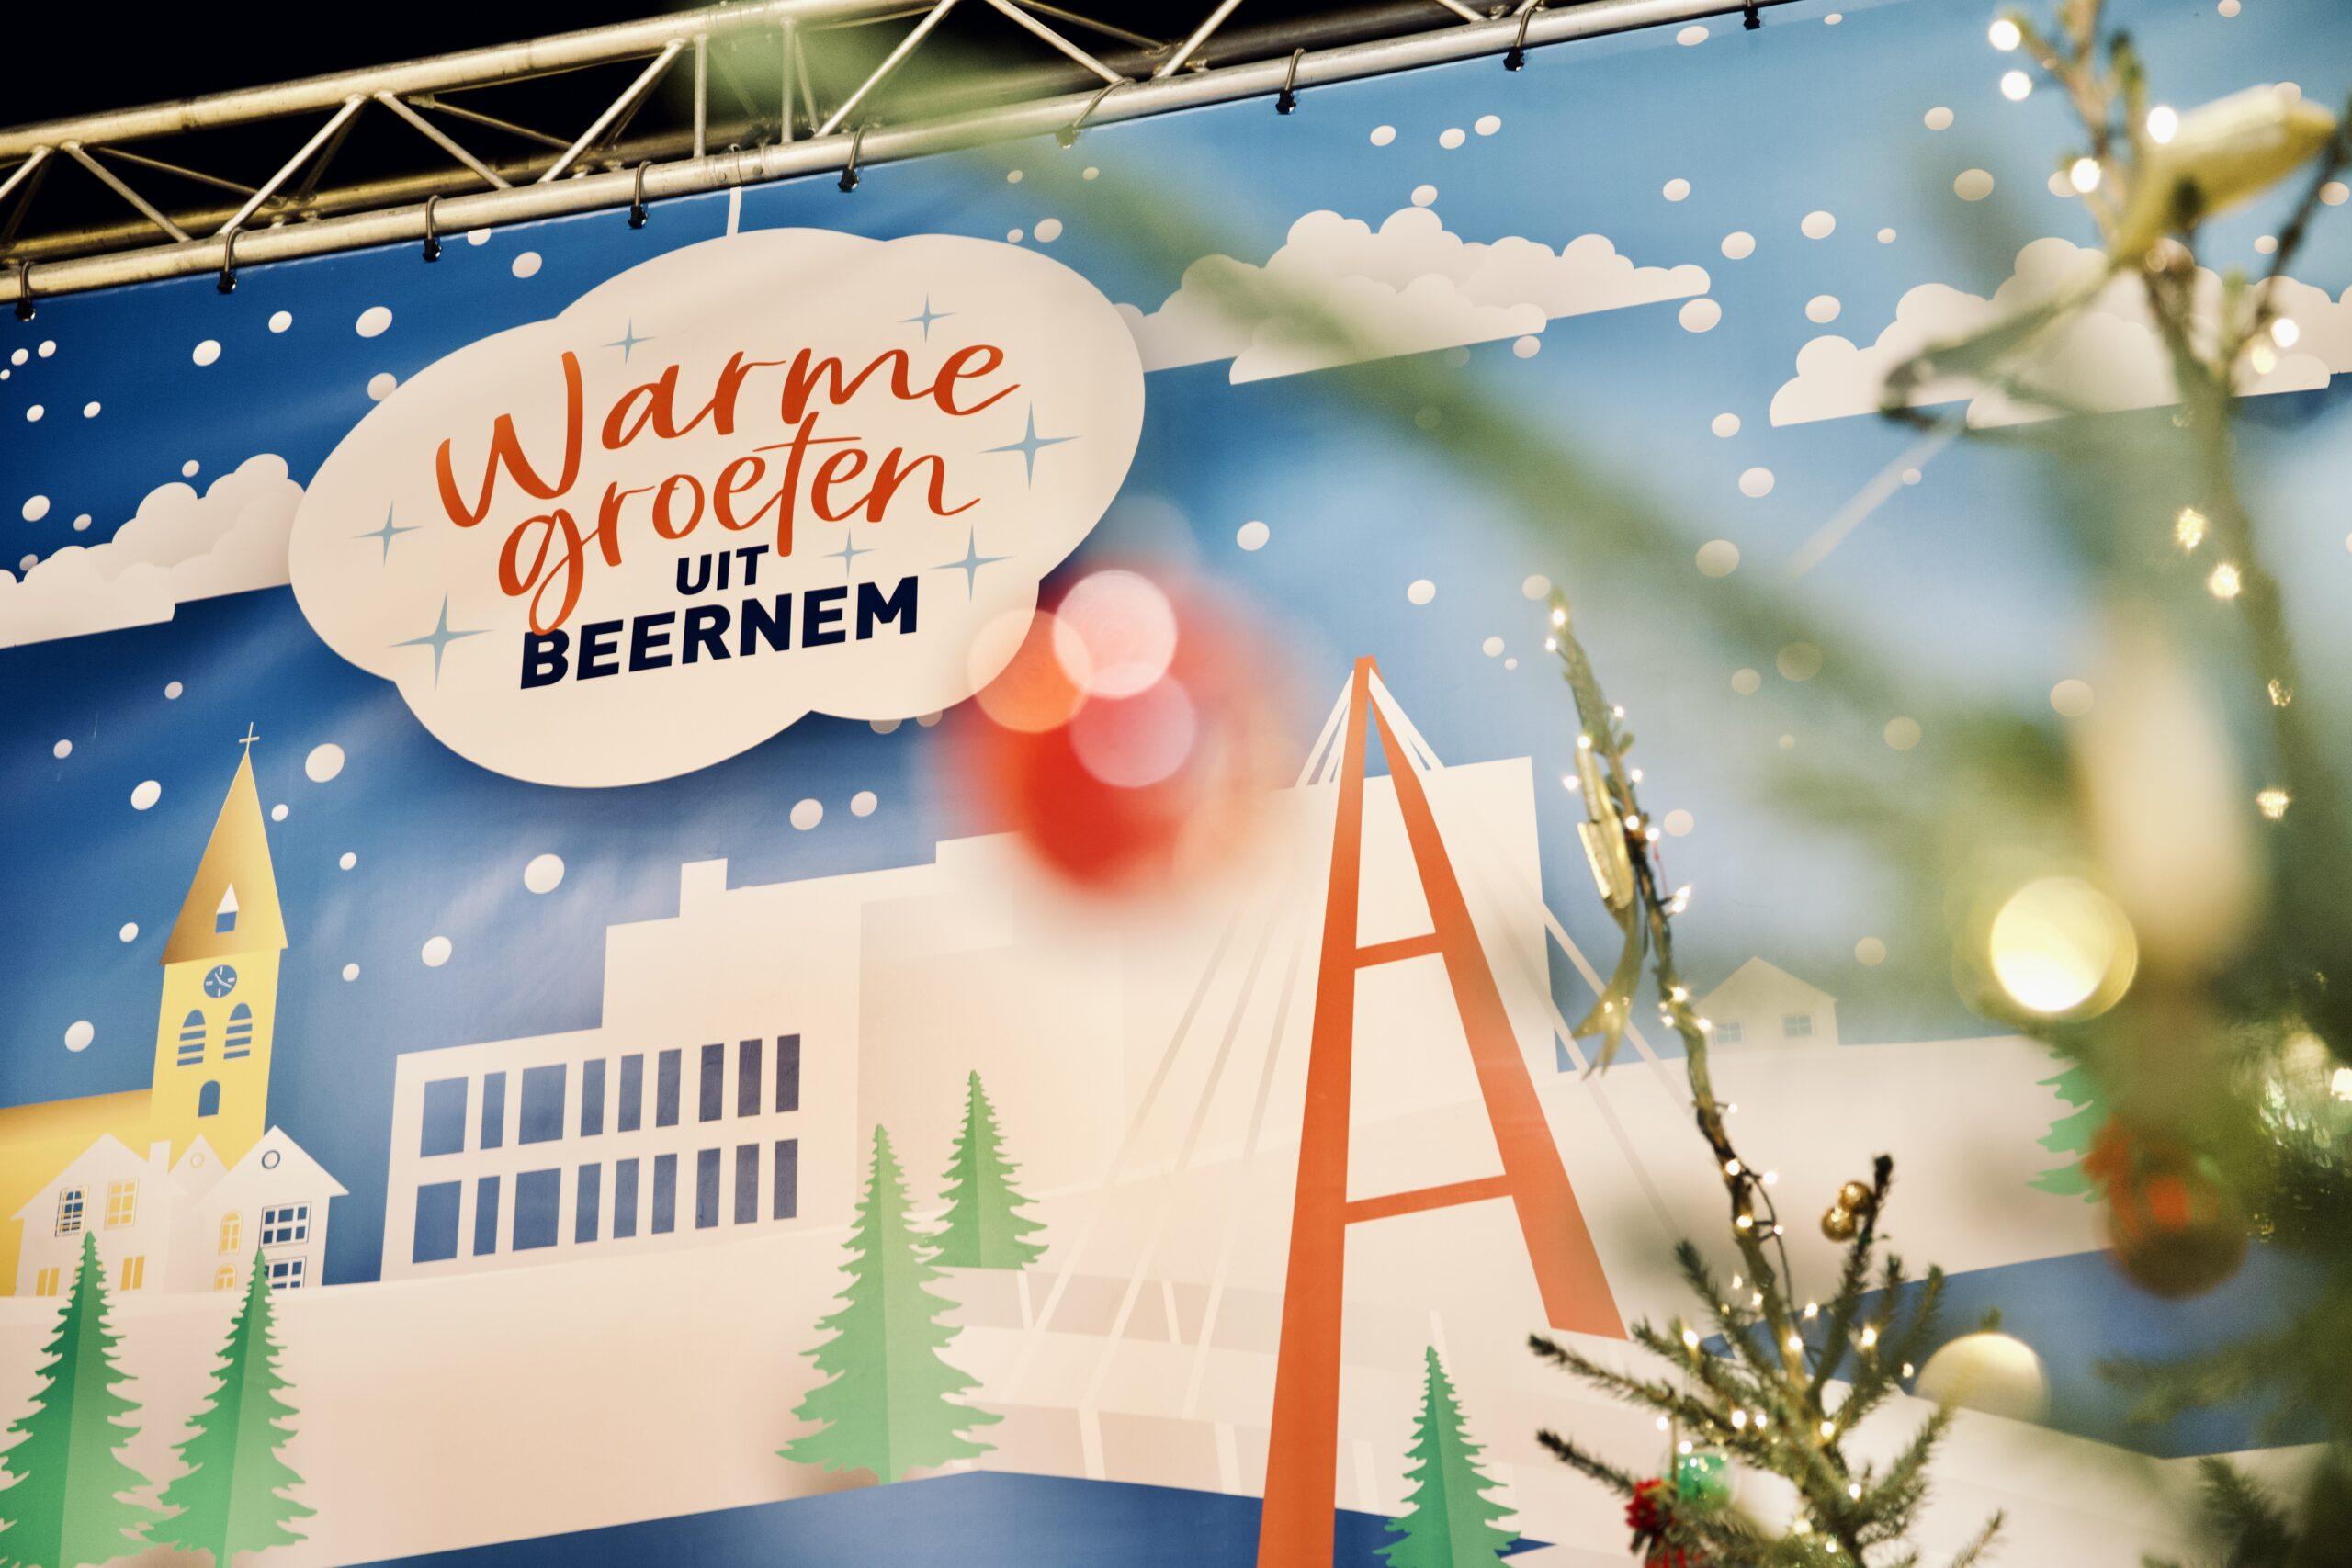 Warme groeten uit Beernem